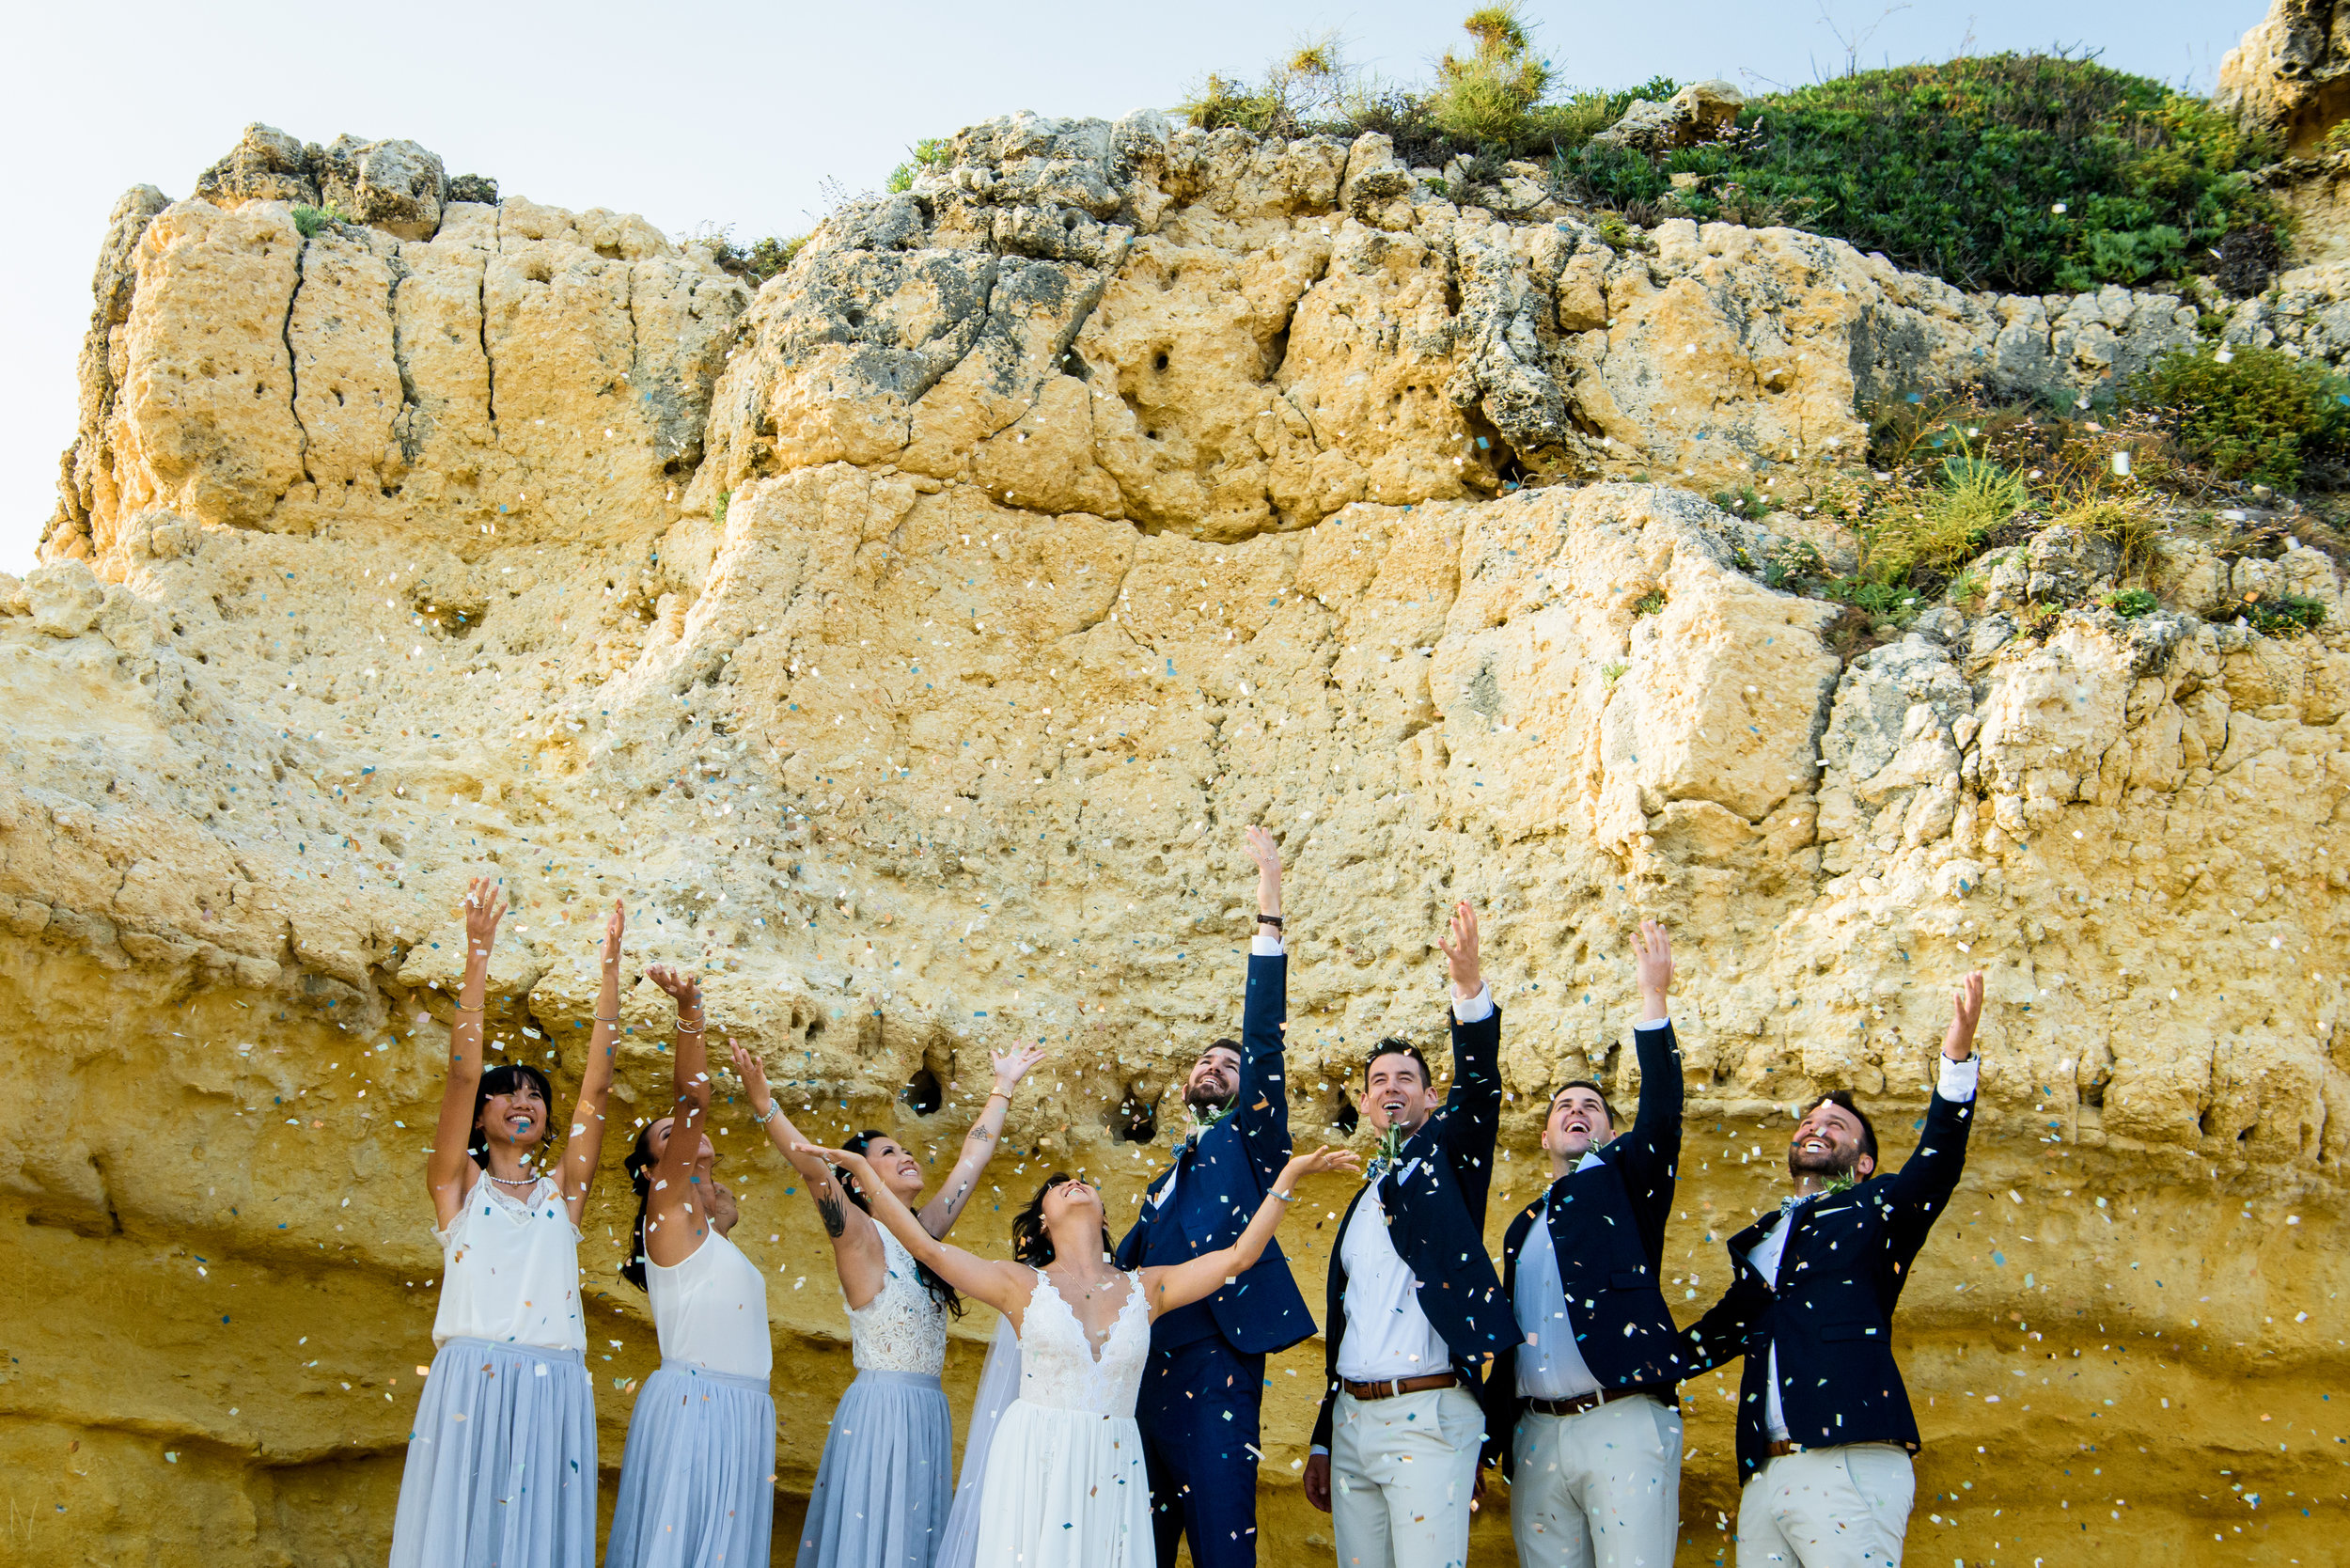 minty-frank-wedding-favorites-159.jpg